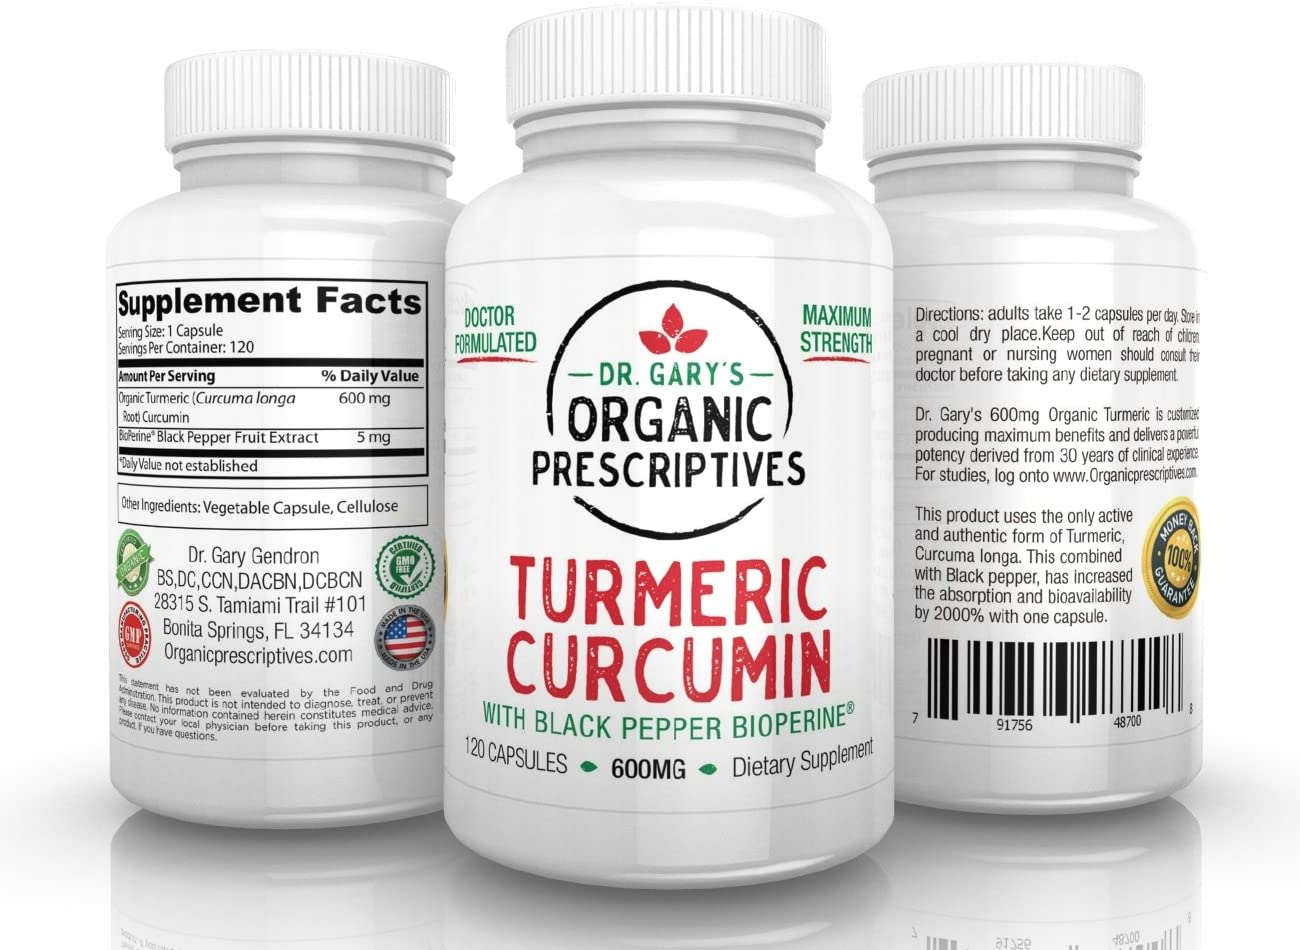 Latest item Dr. Gary's Organic Curcumin Turmeric OFFicial mail order Prescriptives